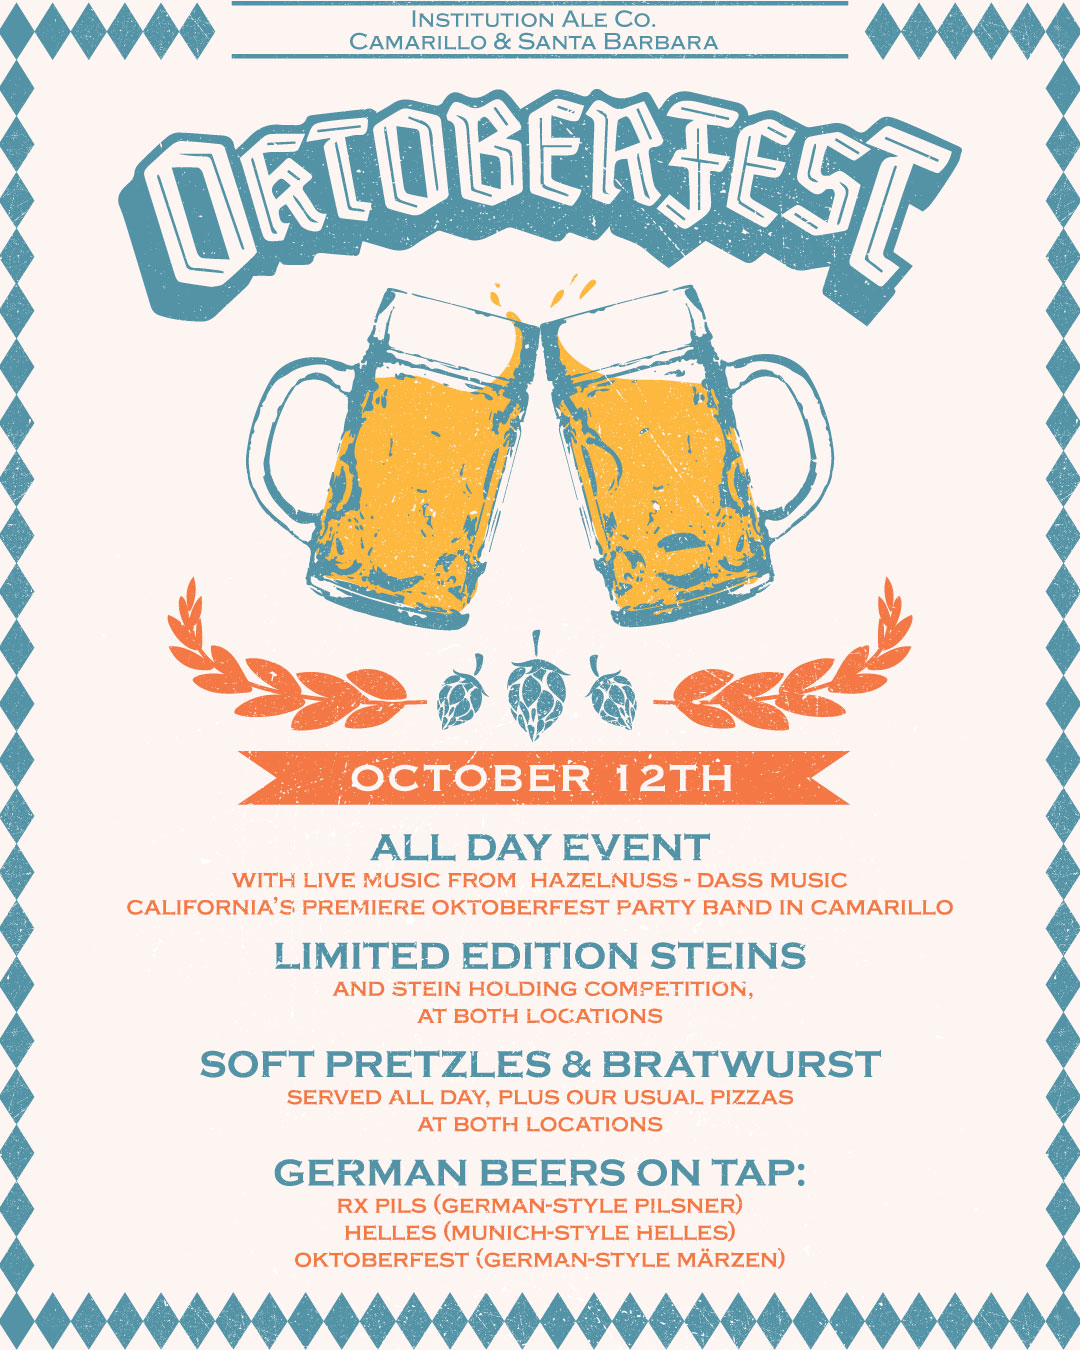 Oktoberfest_2019_Instagram_Flyer.jpg